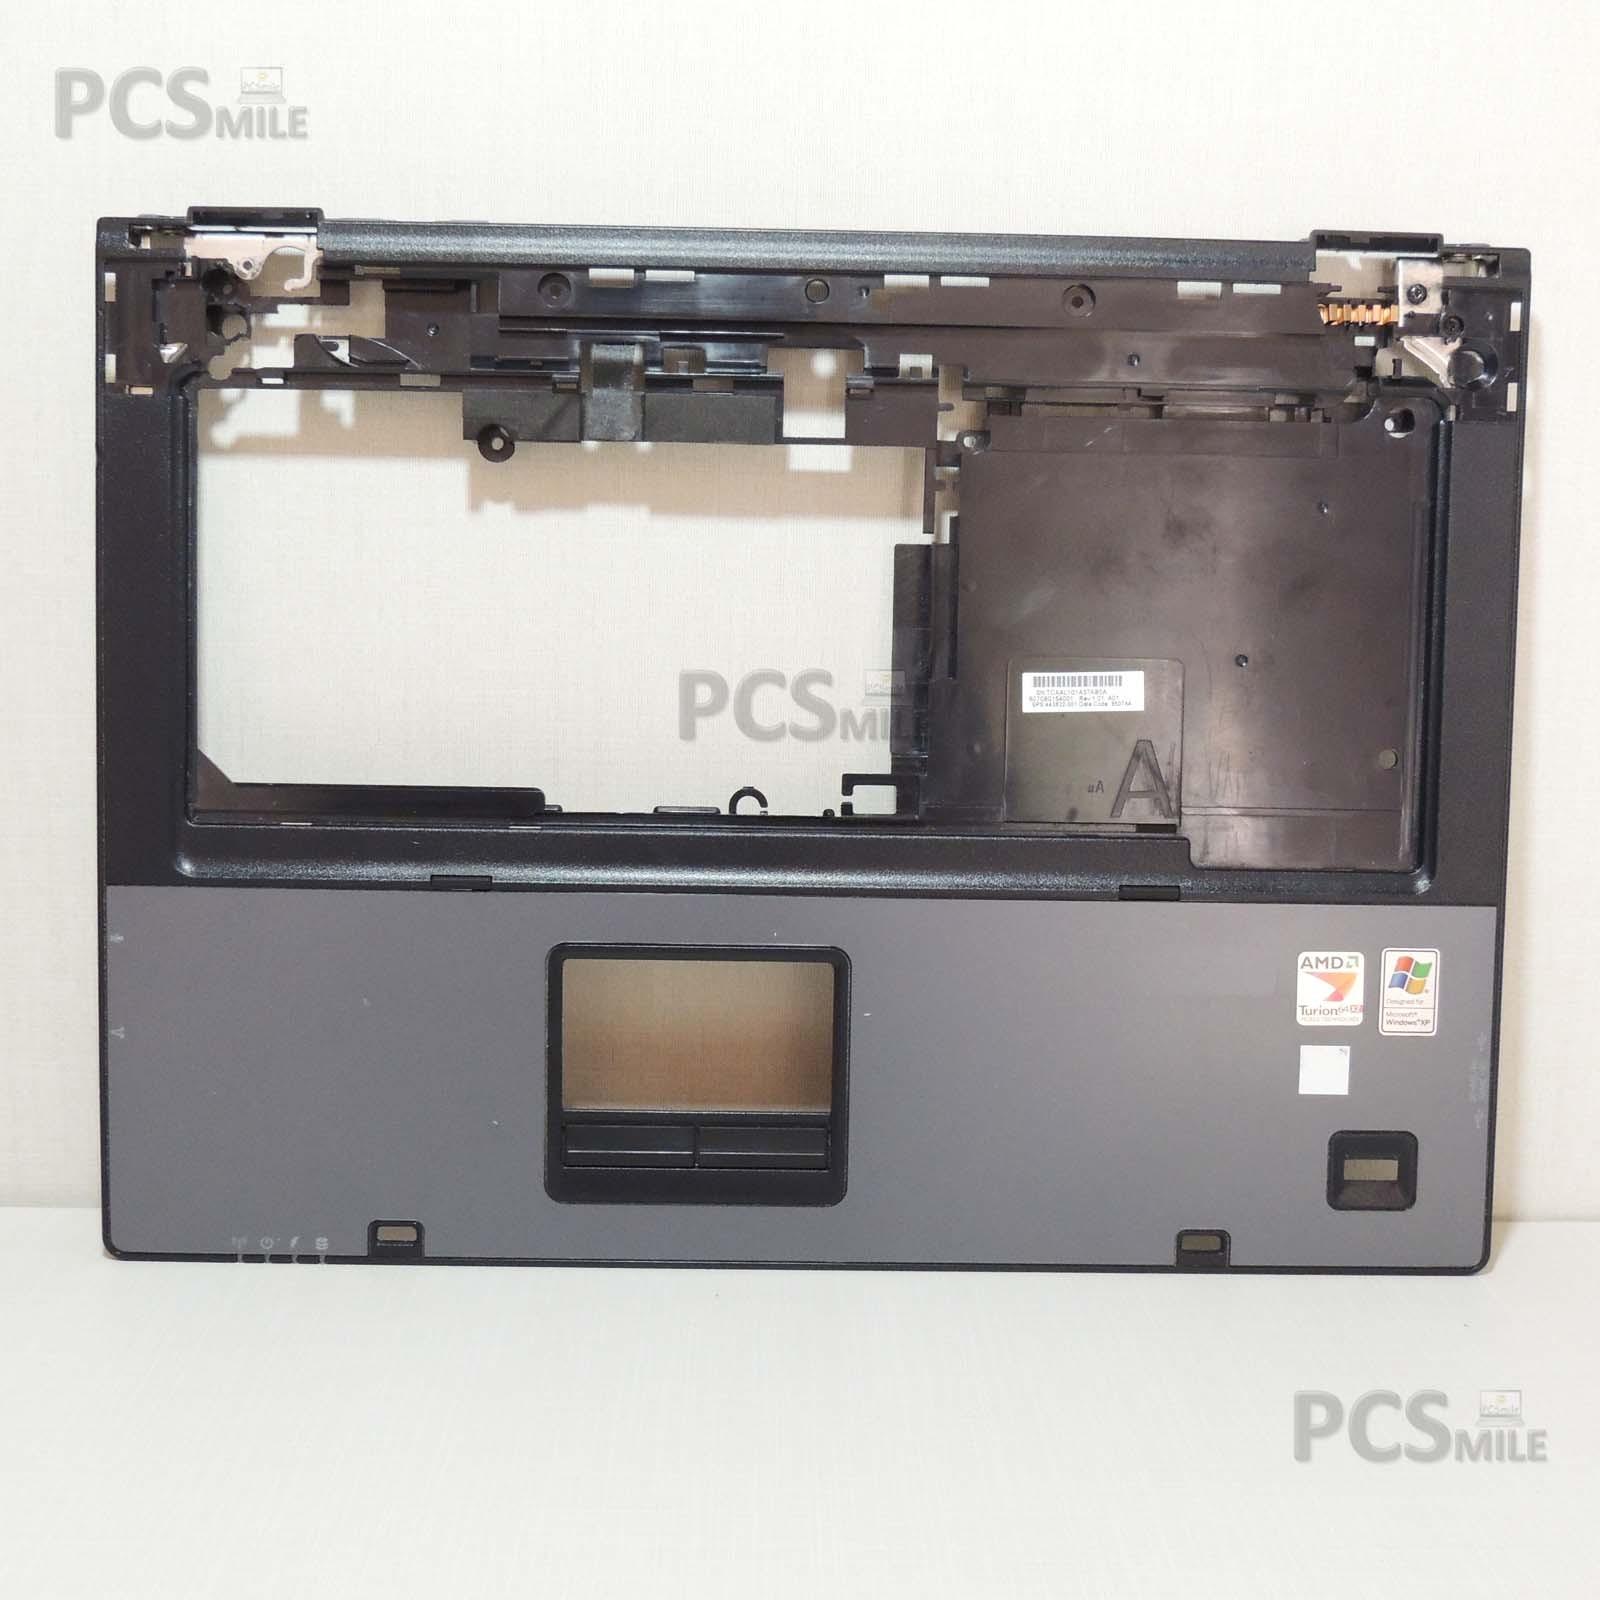 Palmrest scocca anteriore sottotastiera HP Compaq 6751b 6070B0154001